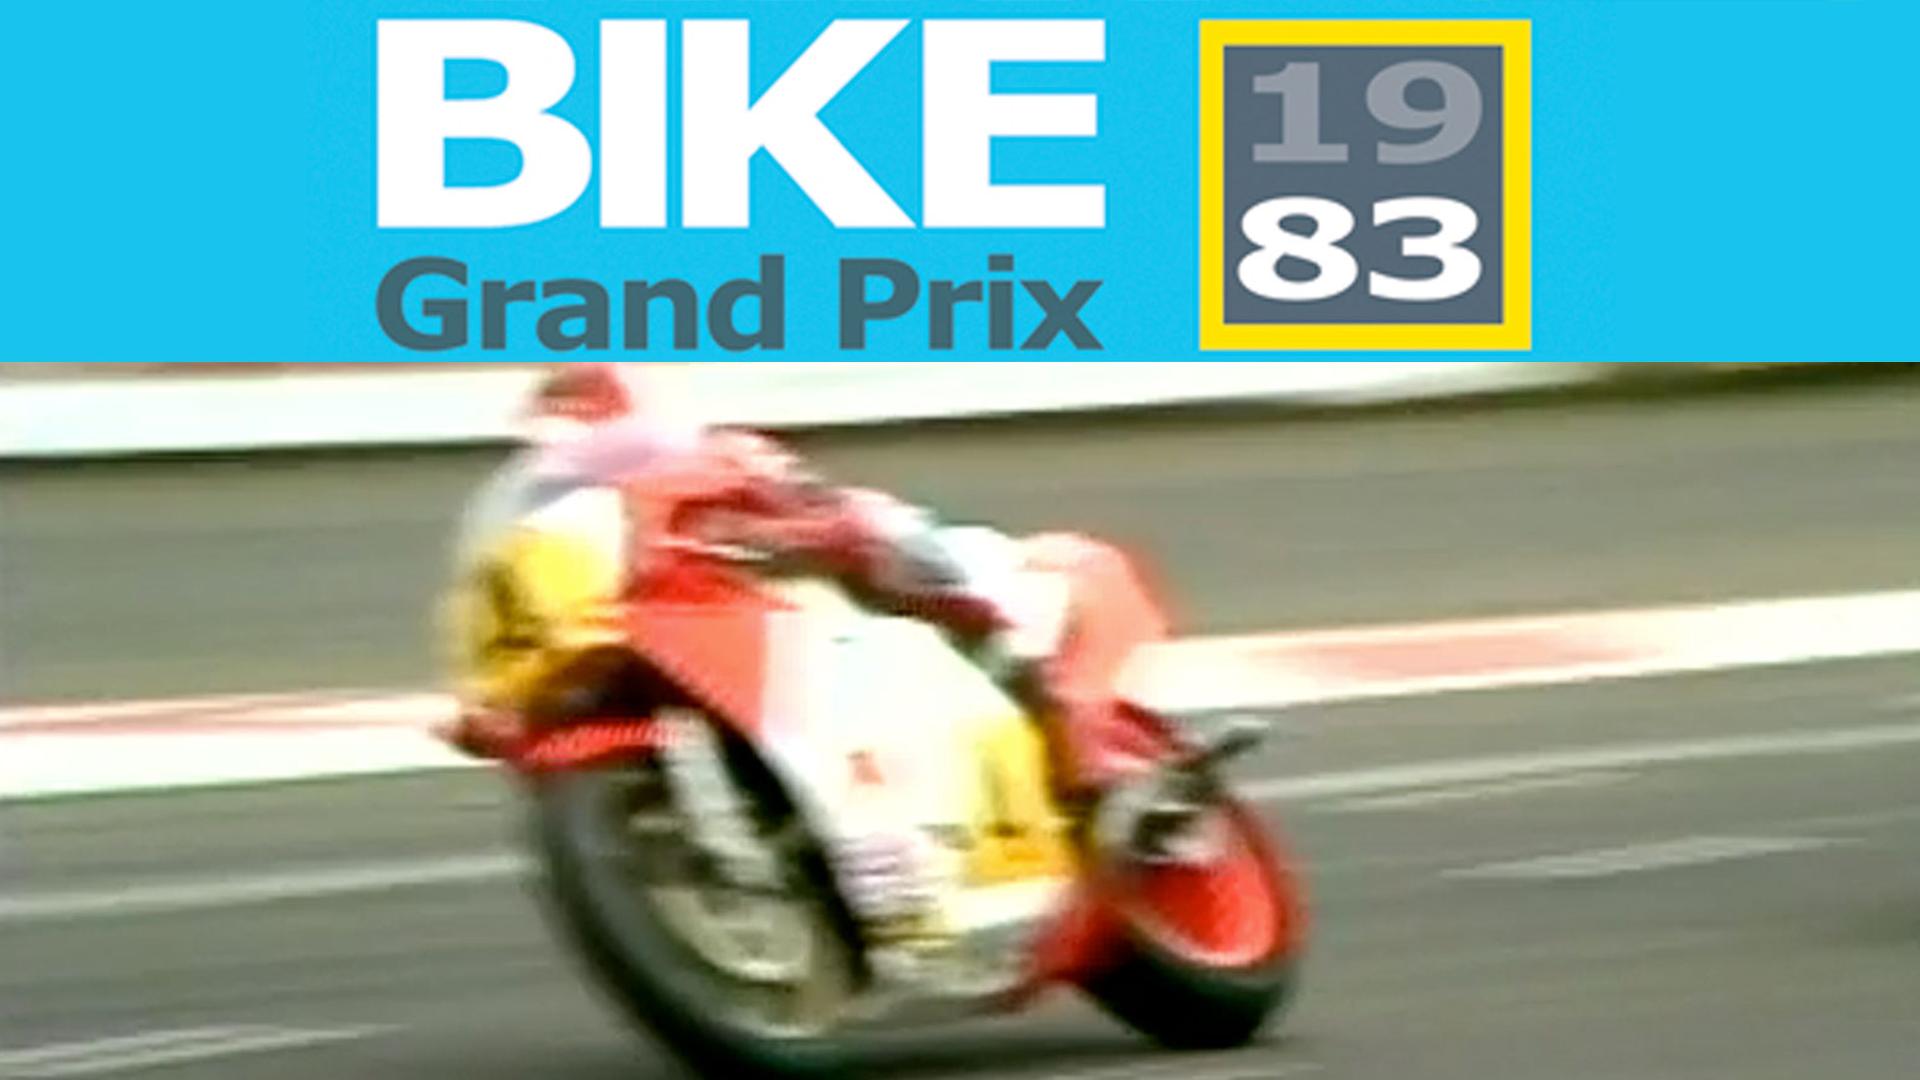 Silverstone 83 The British Motorcycle Grand Prix